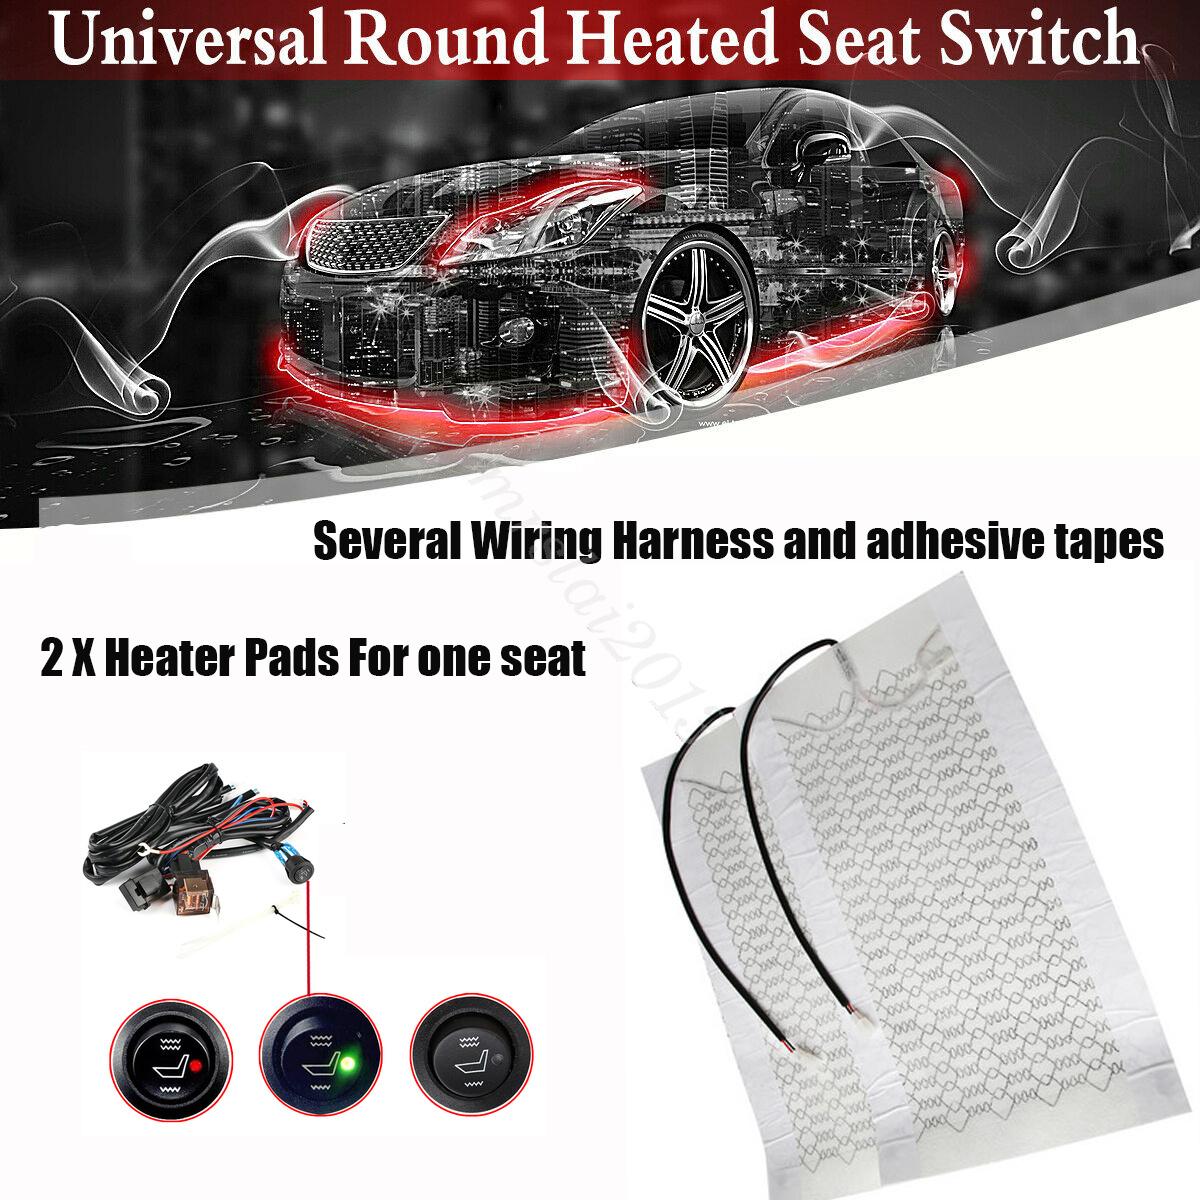 Universal Car Seat Carbon Fiber Heated Seat Heating Pads Round Switch Kit Truck Ushirika Coop